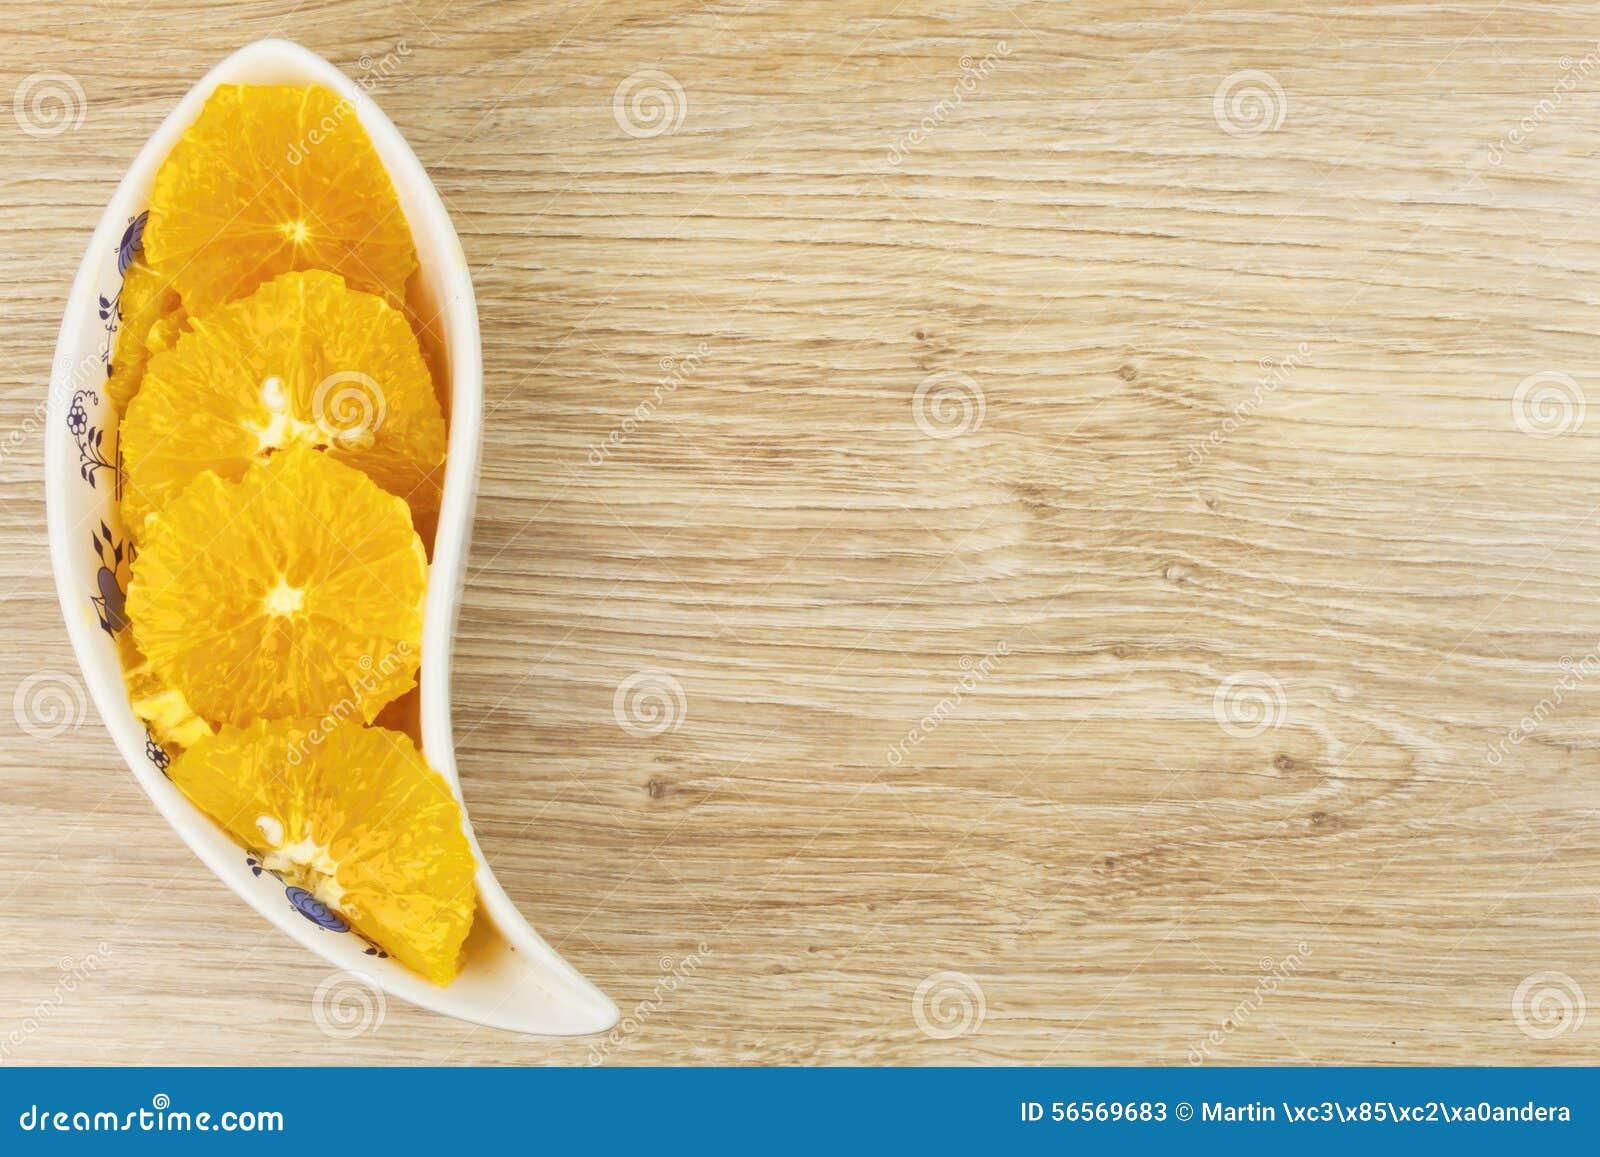 Download Ξεφλουδισμένο και τεμαχισμένο πορτοκάλι σε ένα κύπελλο πορσελάνης Στοκ Εικόνα - εικόνα από fruity, γεωργίας: 56569683